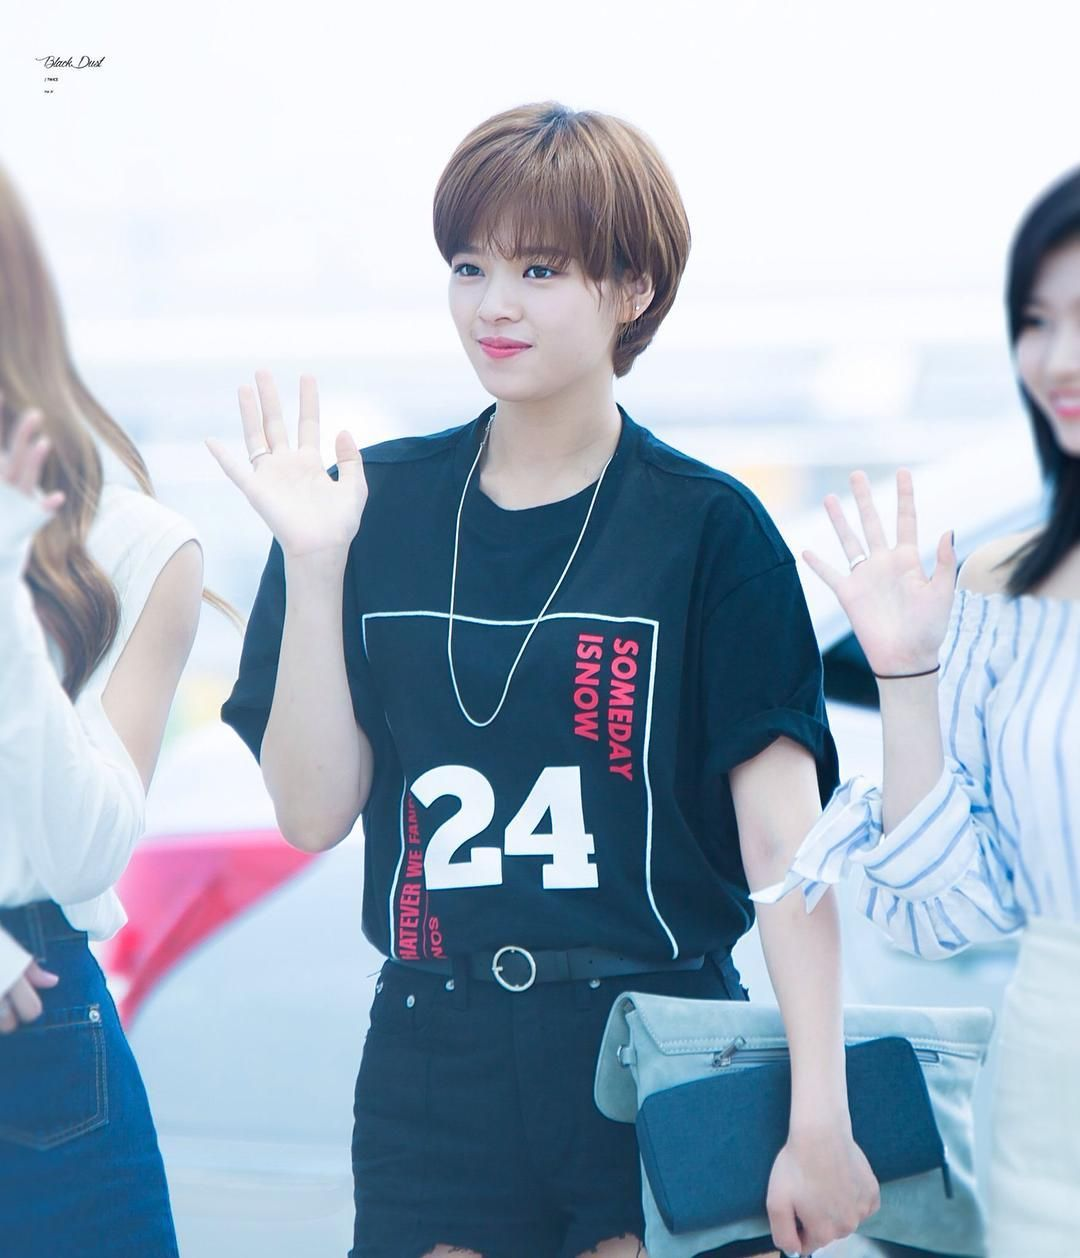 Jeongyeon Airport Fashion Twice Airport Fashion Nayeon Airport Fashion Jeongyeon 2016 Kpop Idol Airport Fashion Idol Air Airport Style Twice Kpop Fashion